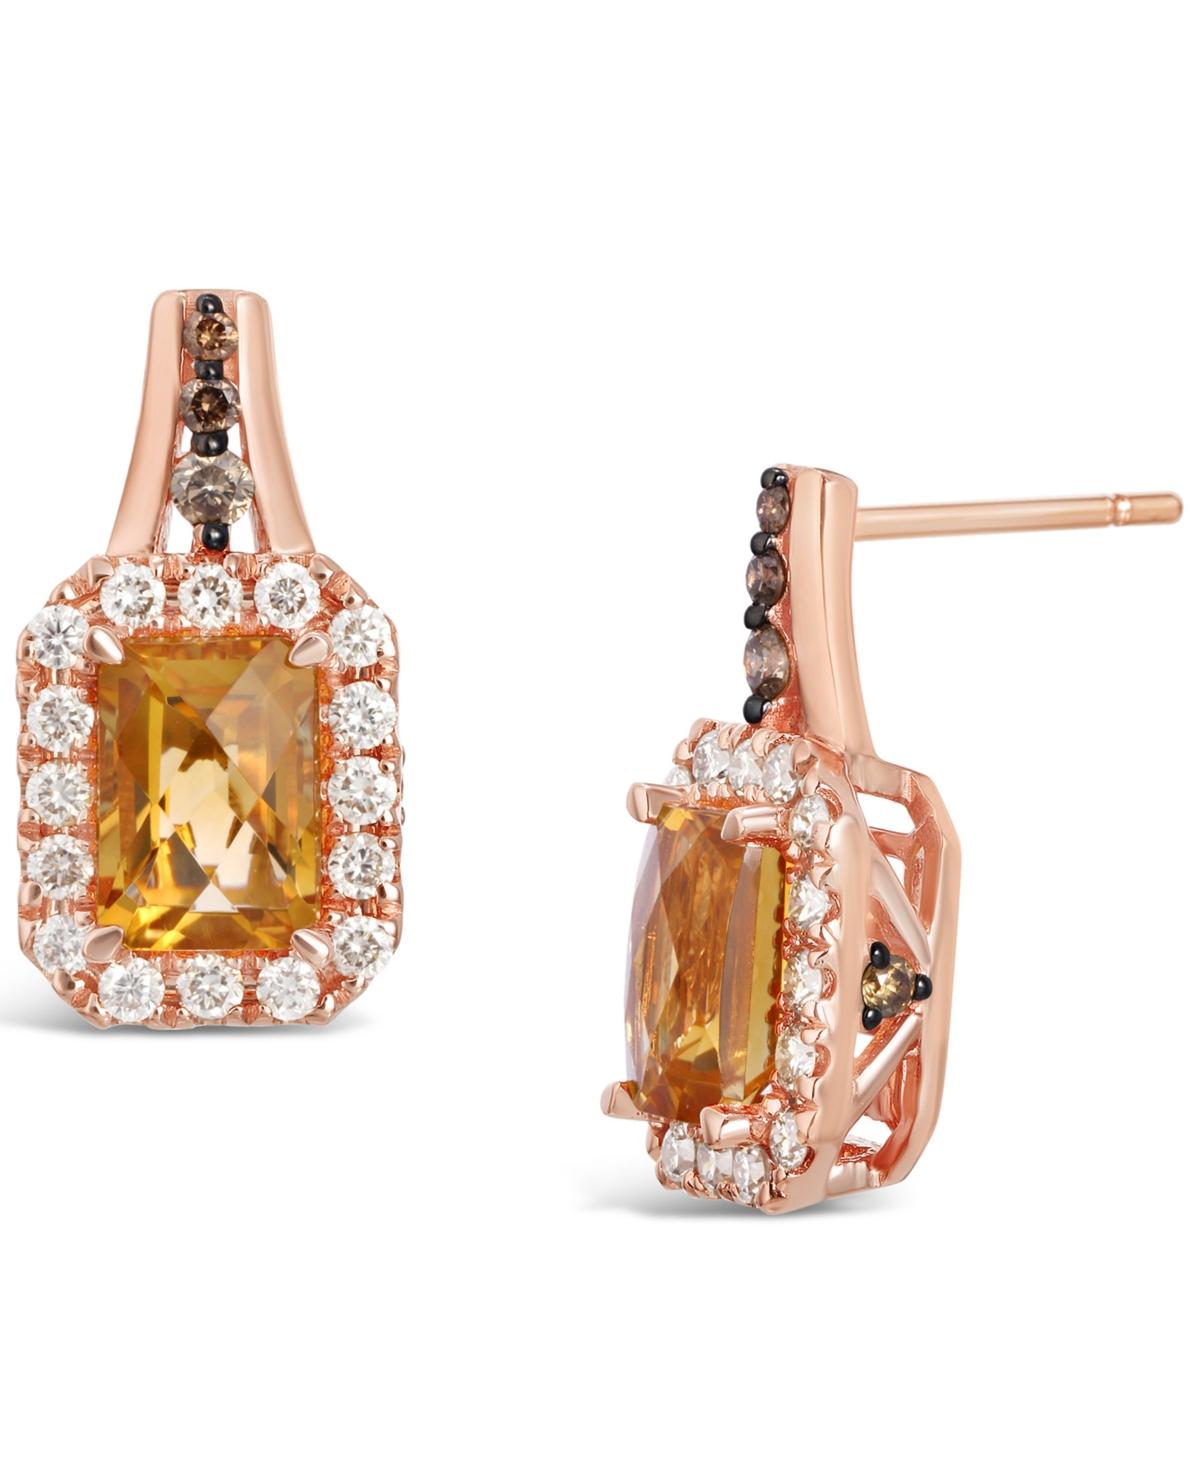 Cinnamon Citrine (2 ct. t.w.) & Diamond (5/8 ct. t.w.) Stud Earrings in 14k Rose Gold